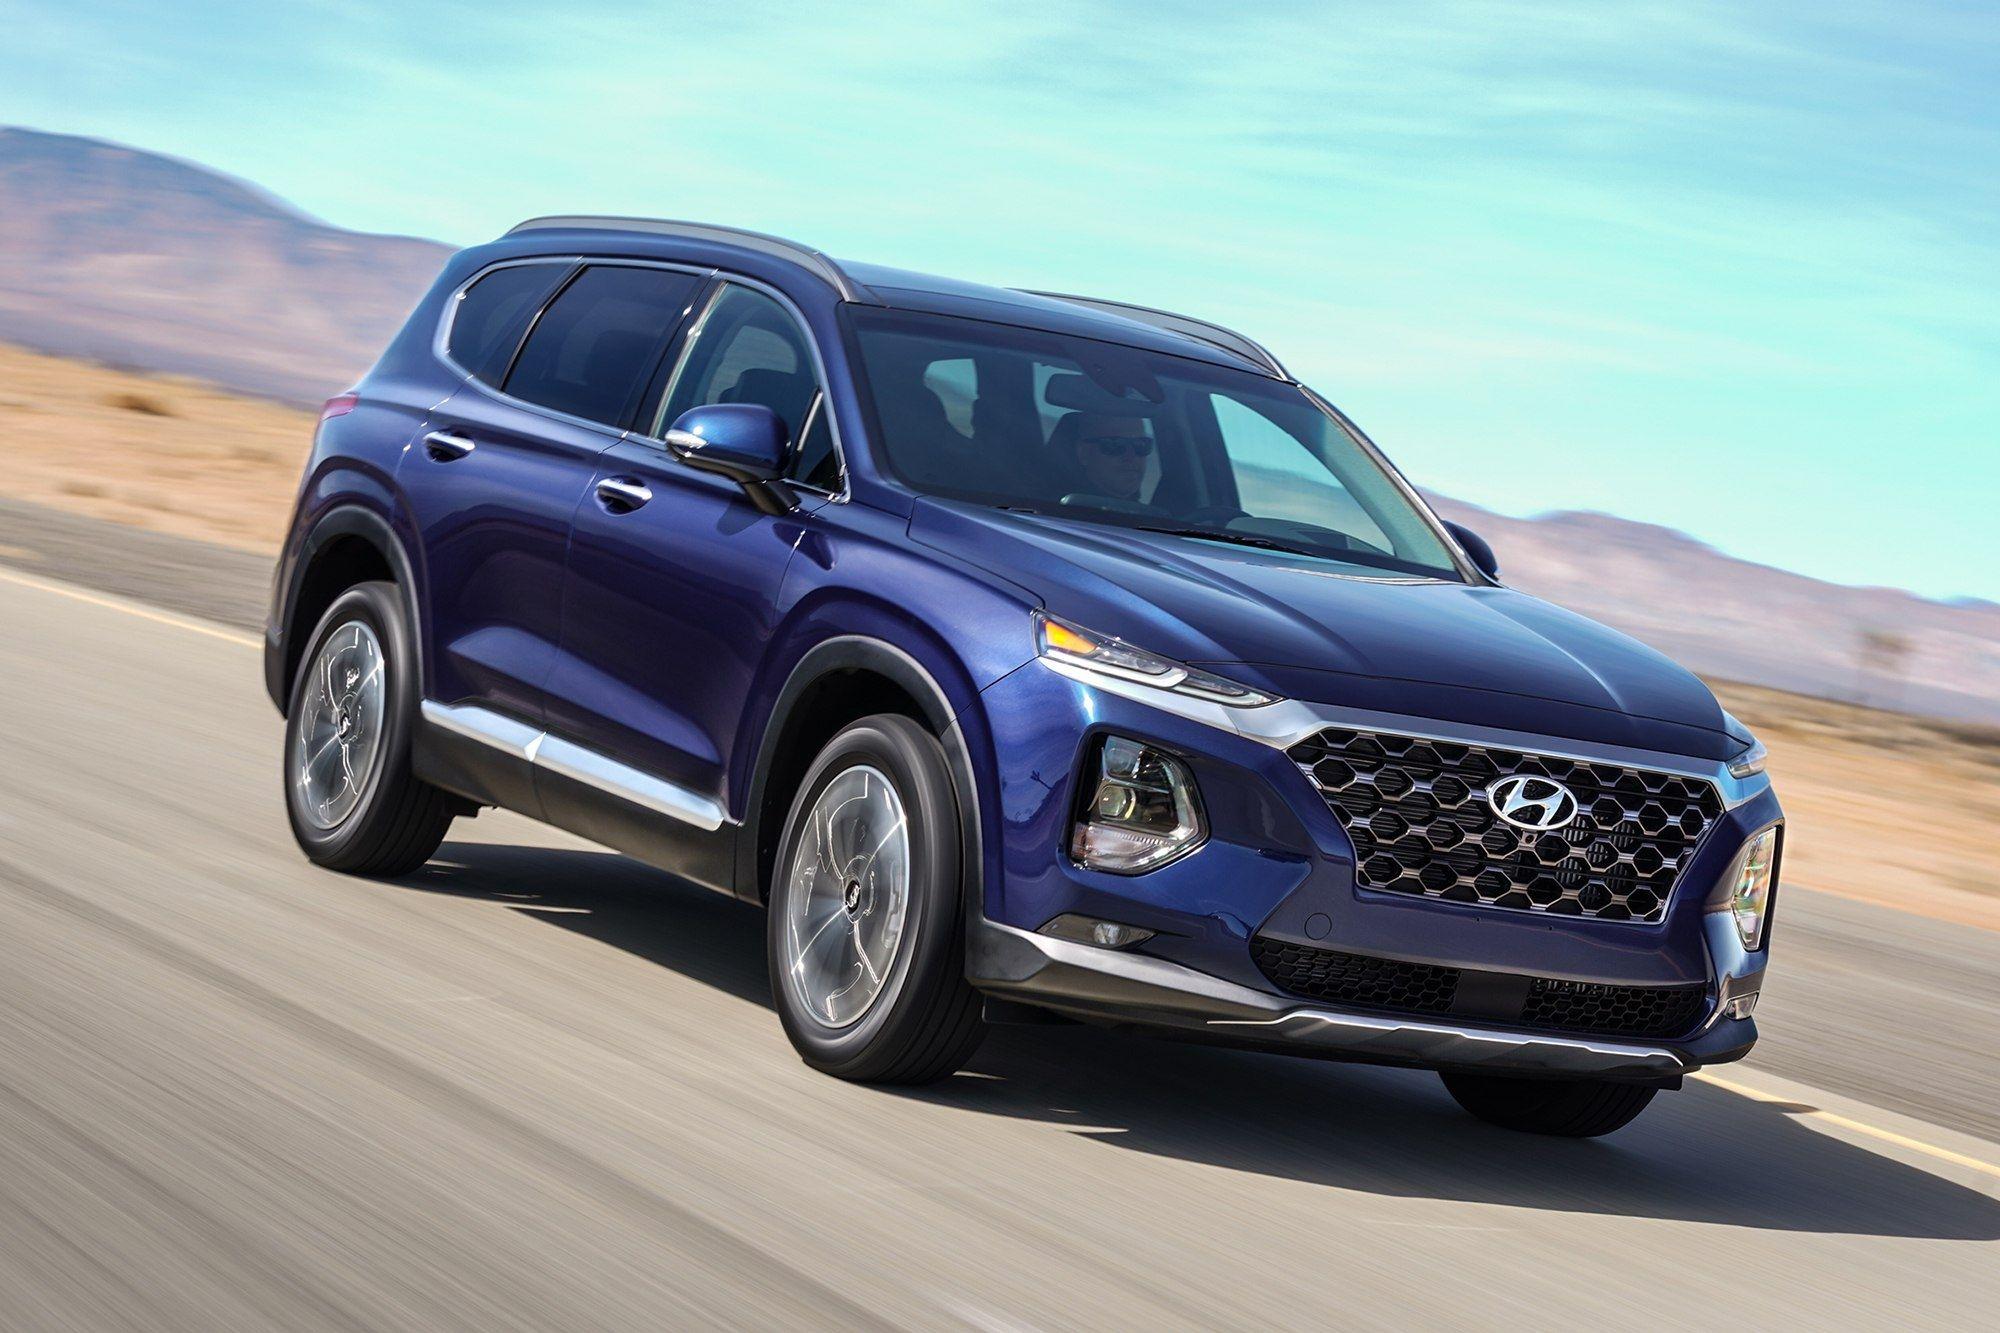 Pics Of Hyundai Santa Fe 2020 Price Santa Fe Sport Hyundai Santa Fe New Santa Fe